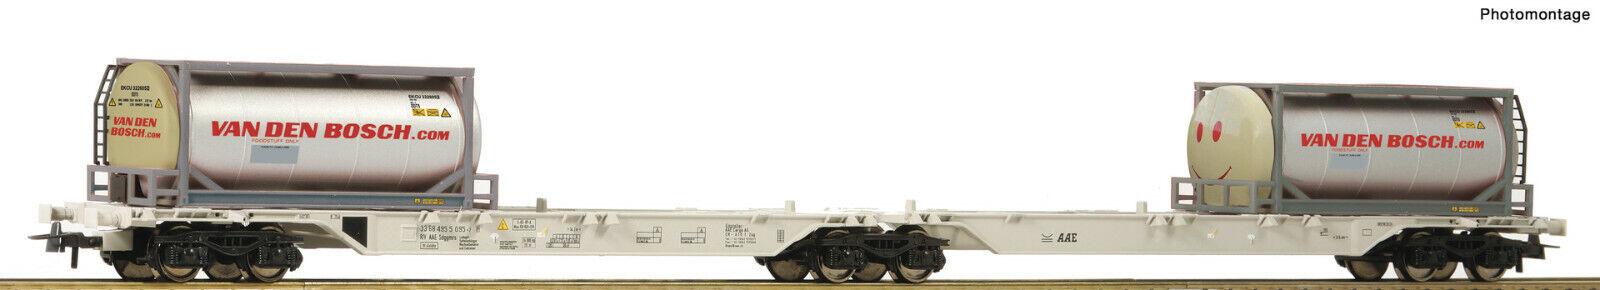 Roco H0 76928 Double Container Wagon   Van Den Bosch   Smiley   Aae - New +Box